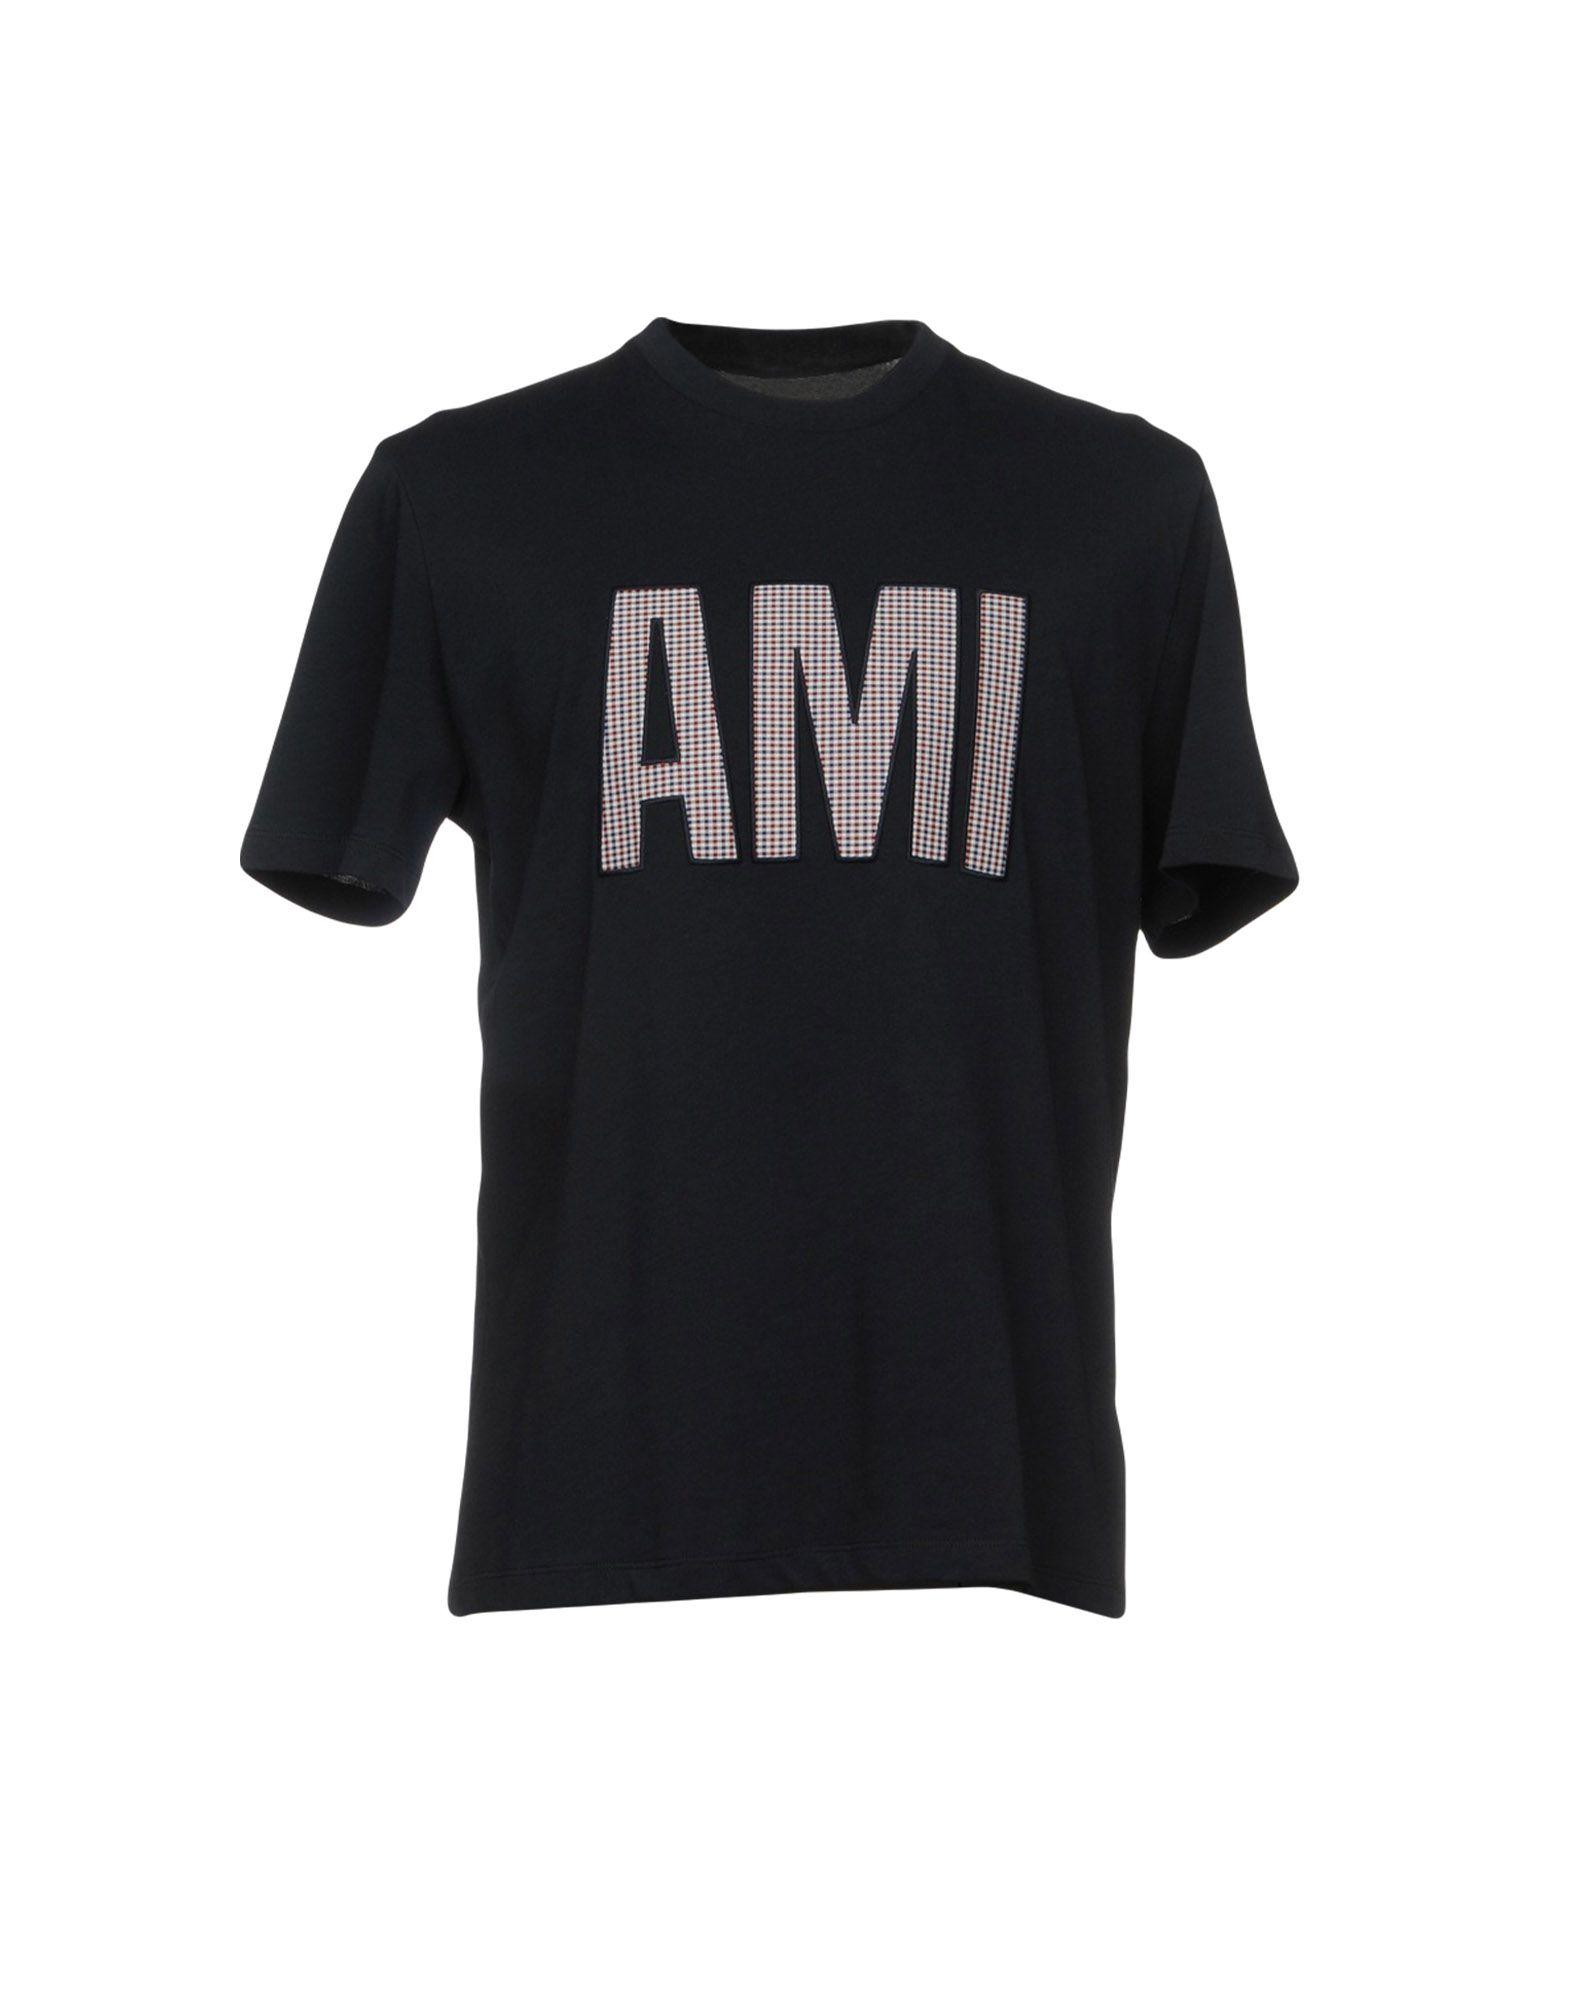 T-Shirt Ami Alexandre Mattiussi Mattiussi Mattiussi uomo - 12088635WU 9c8